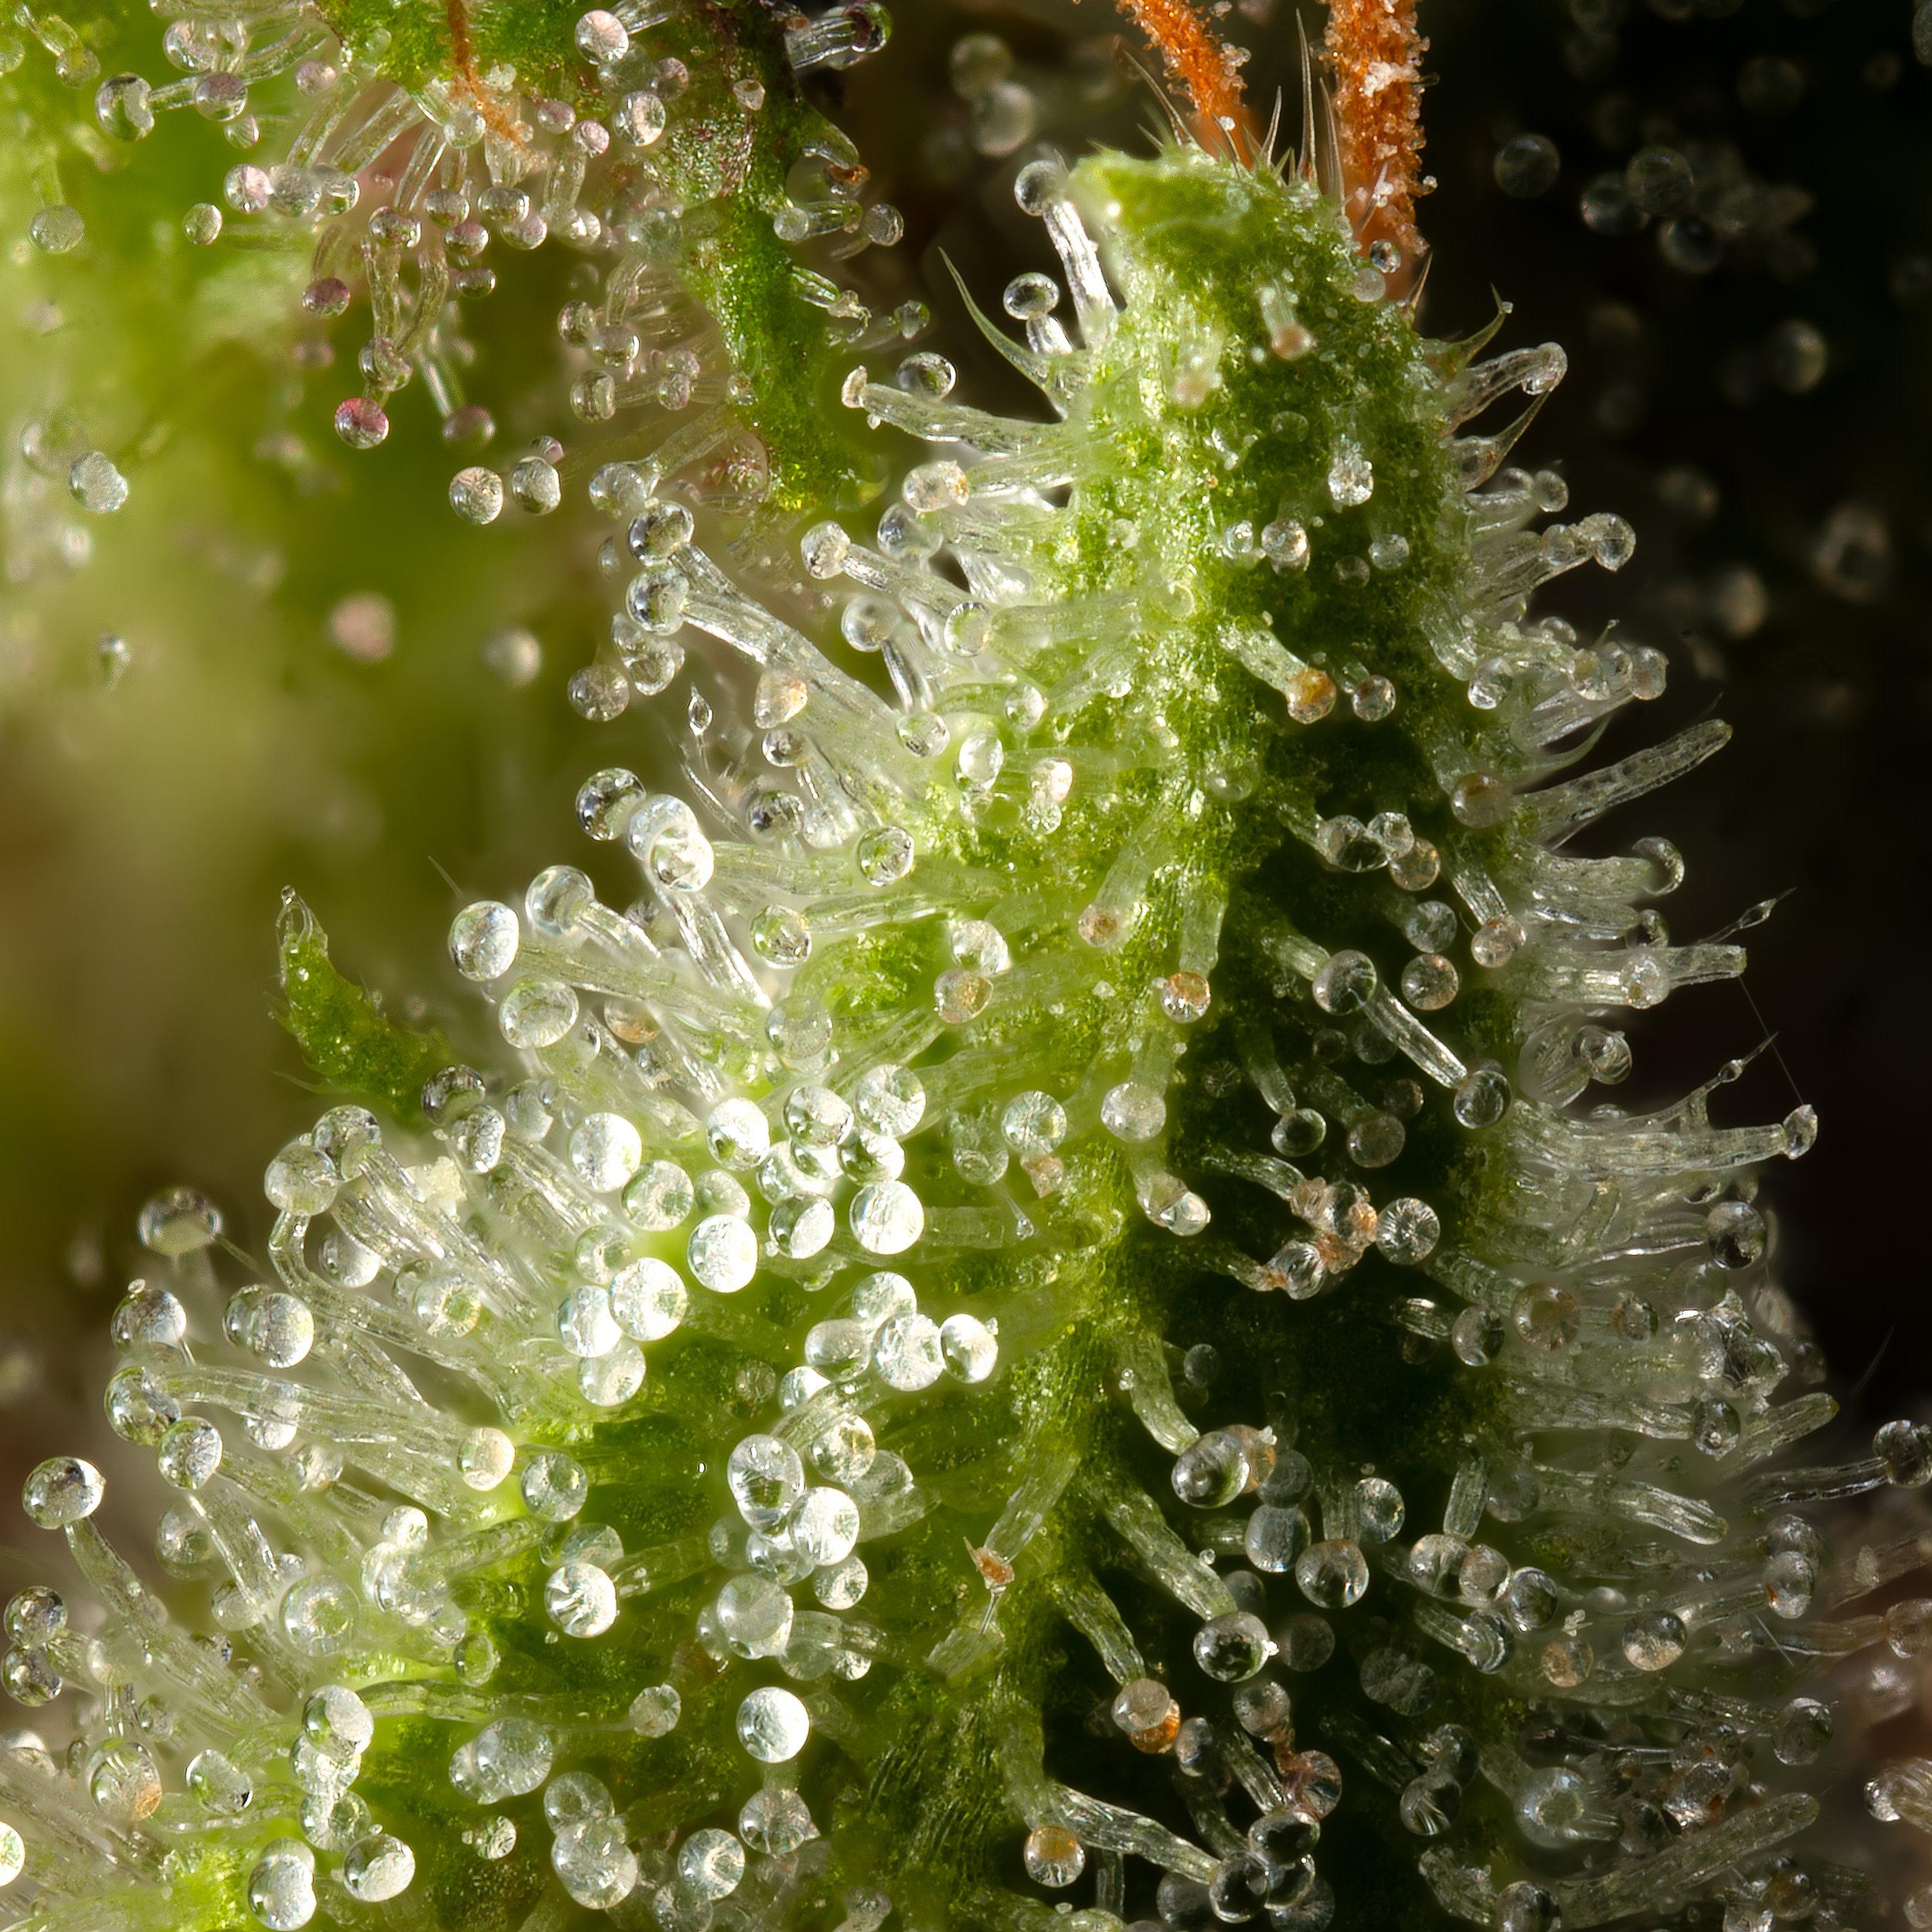 Silverfields trichome leaf